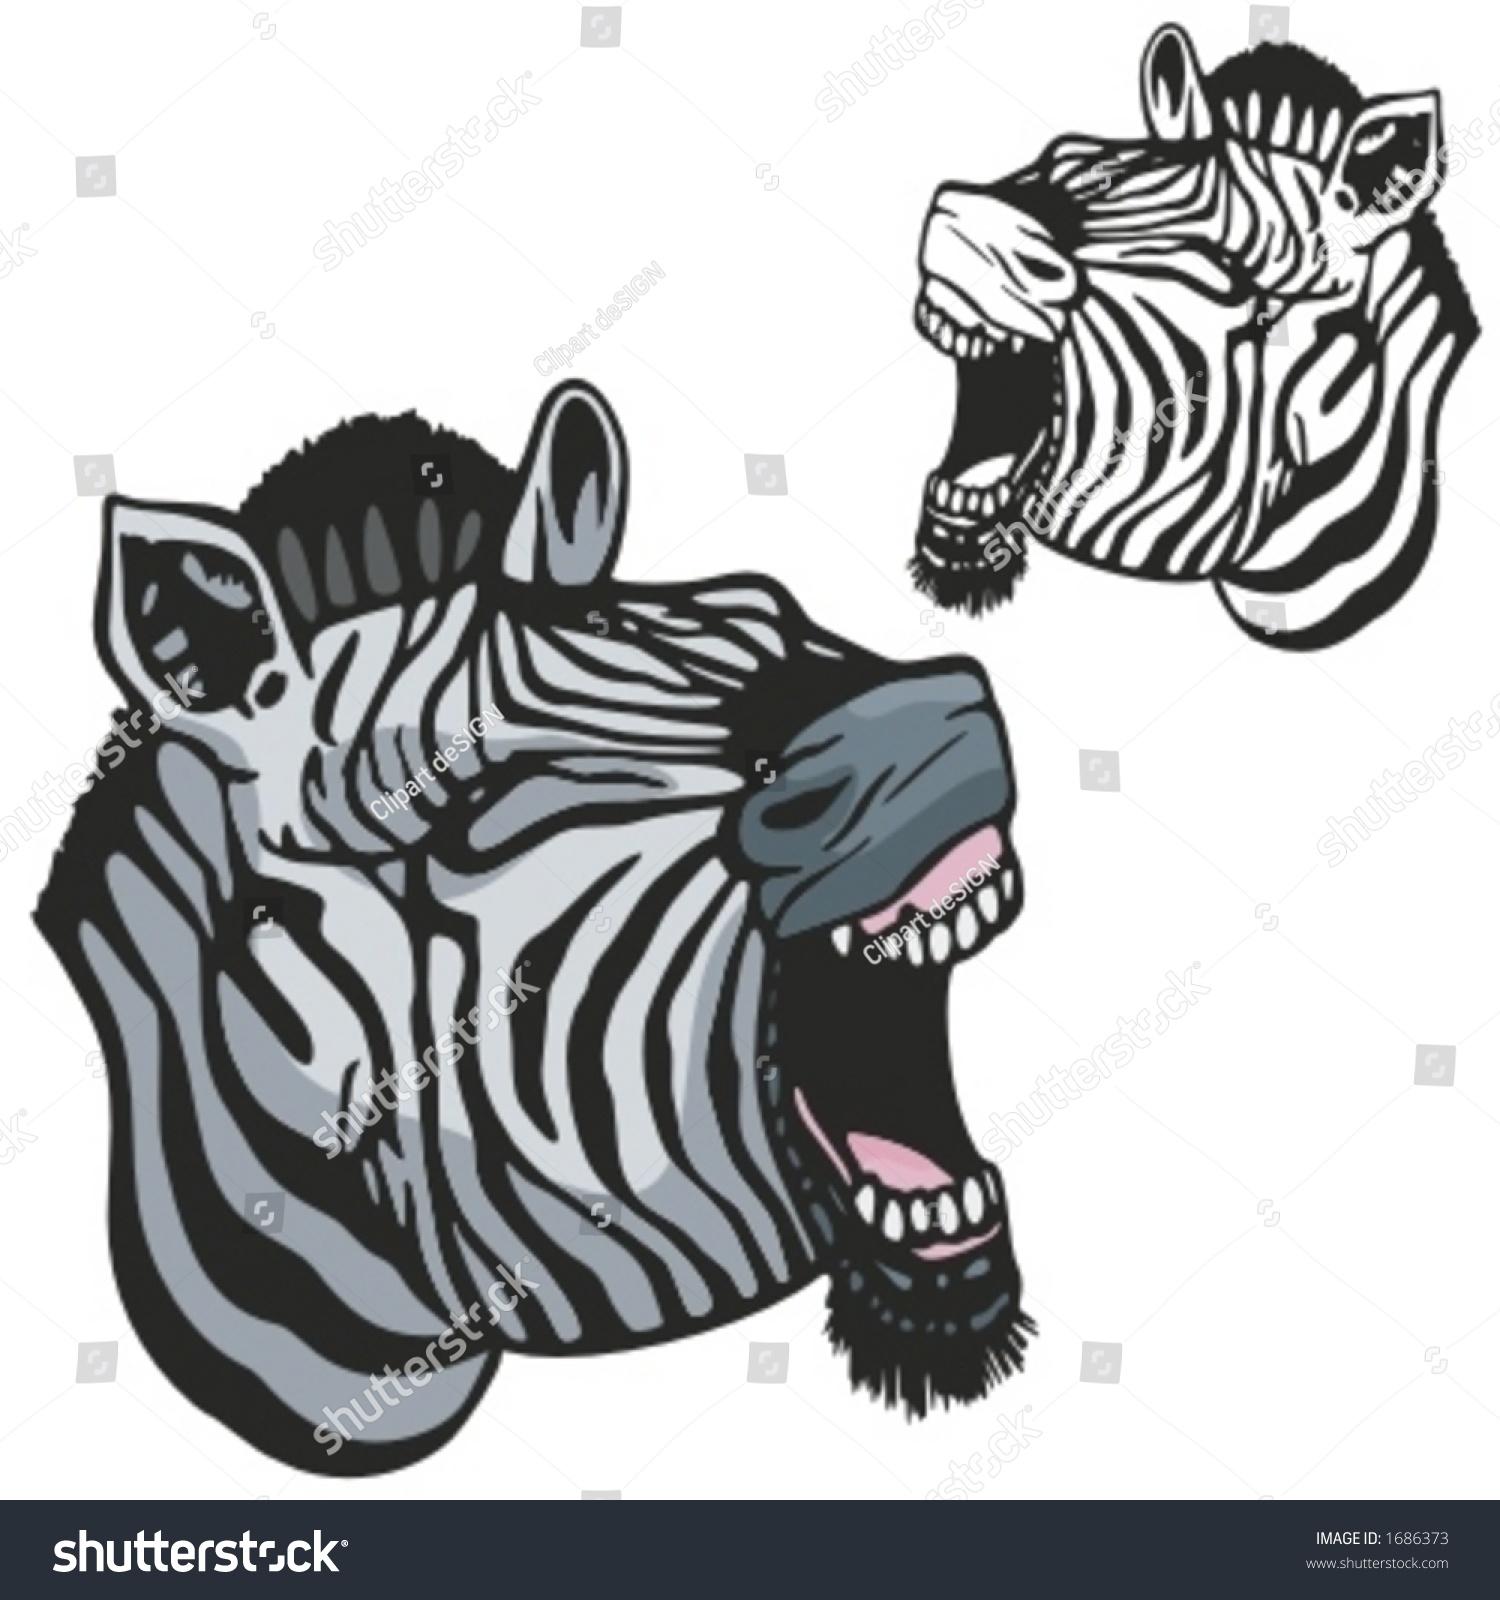 Zebra shirt design - Zebra Mascot For Sport Teams Great For T Shirt Designs School Mascot Logo